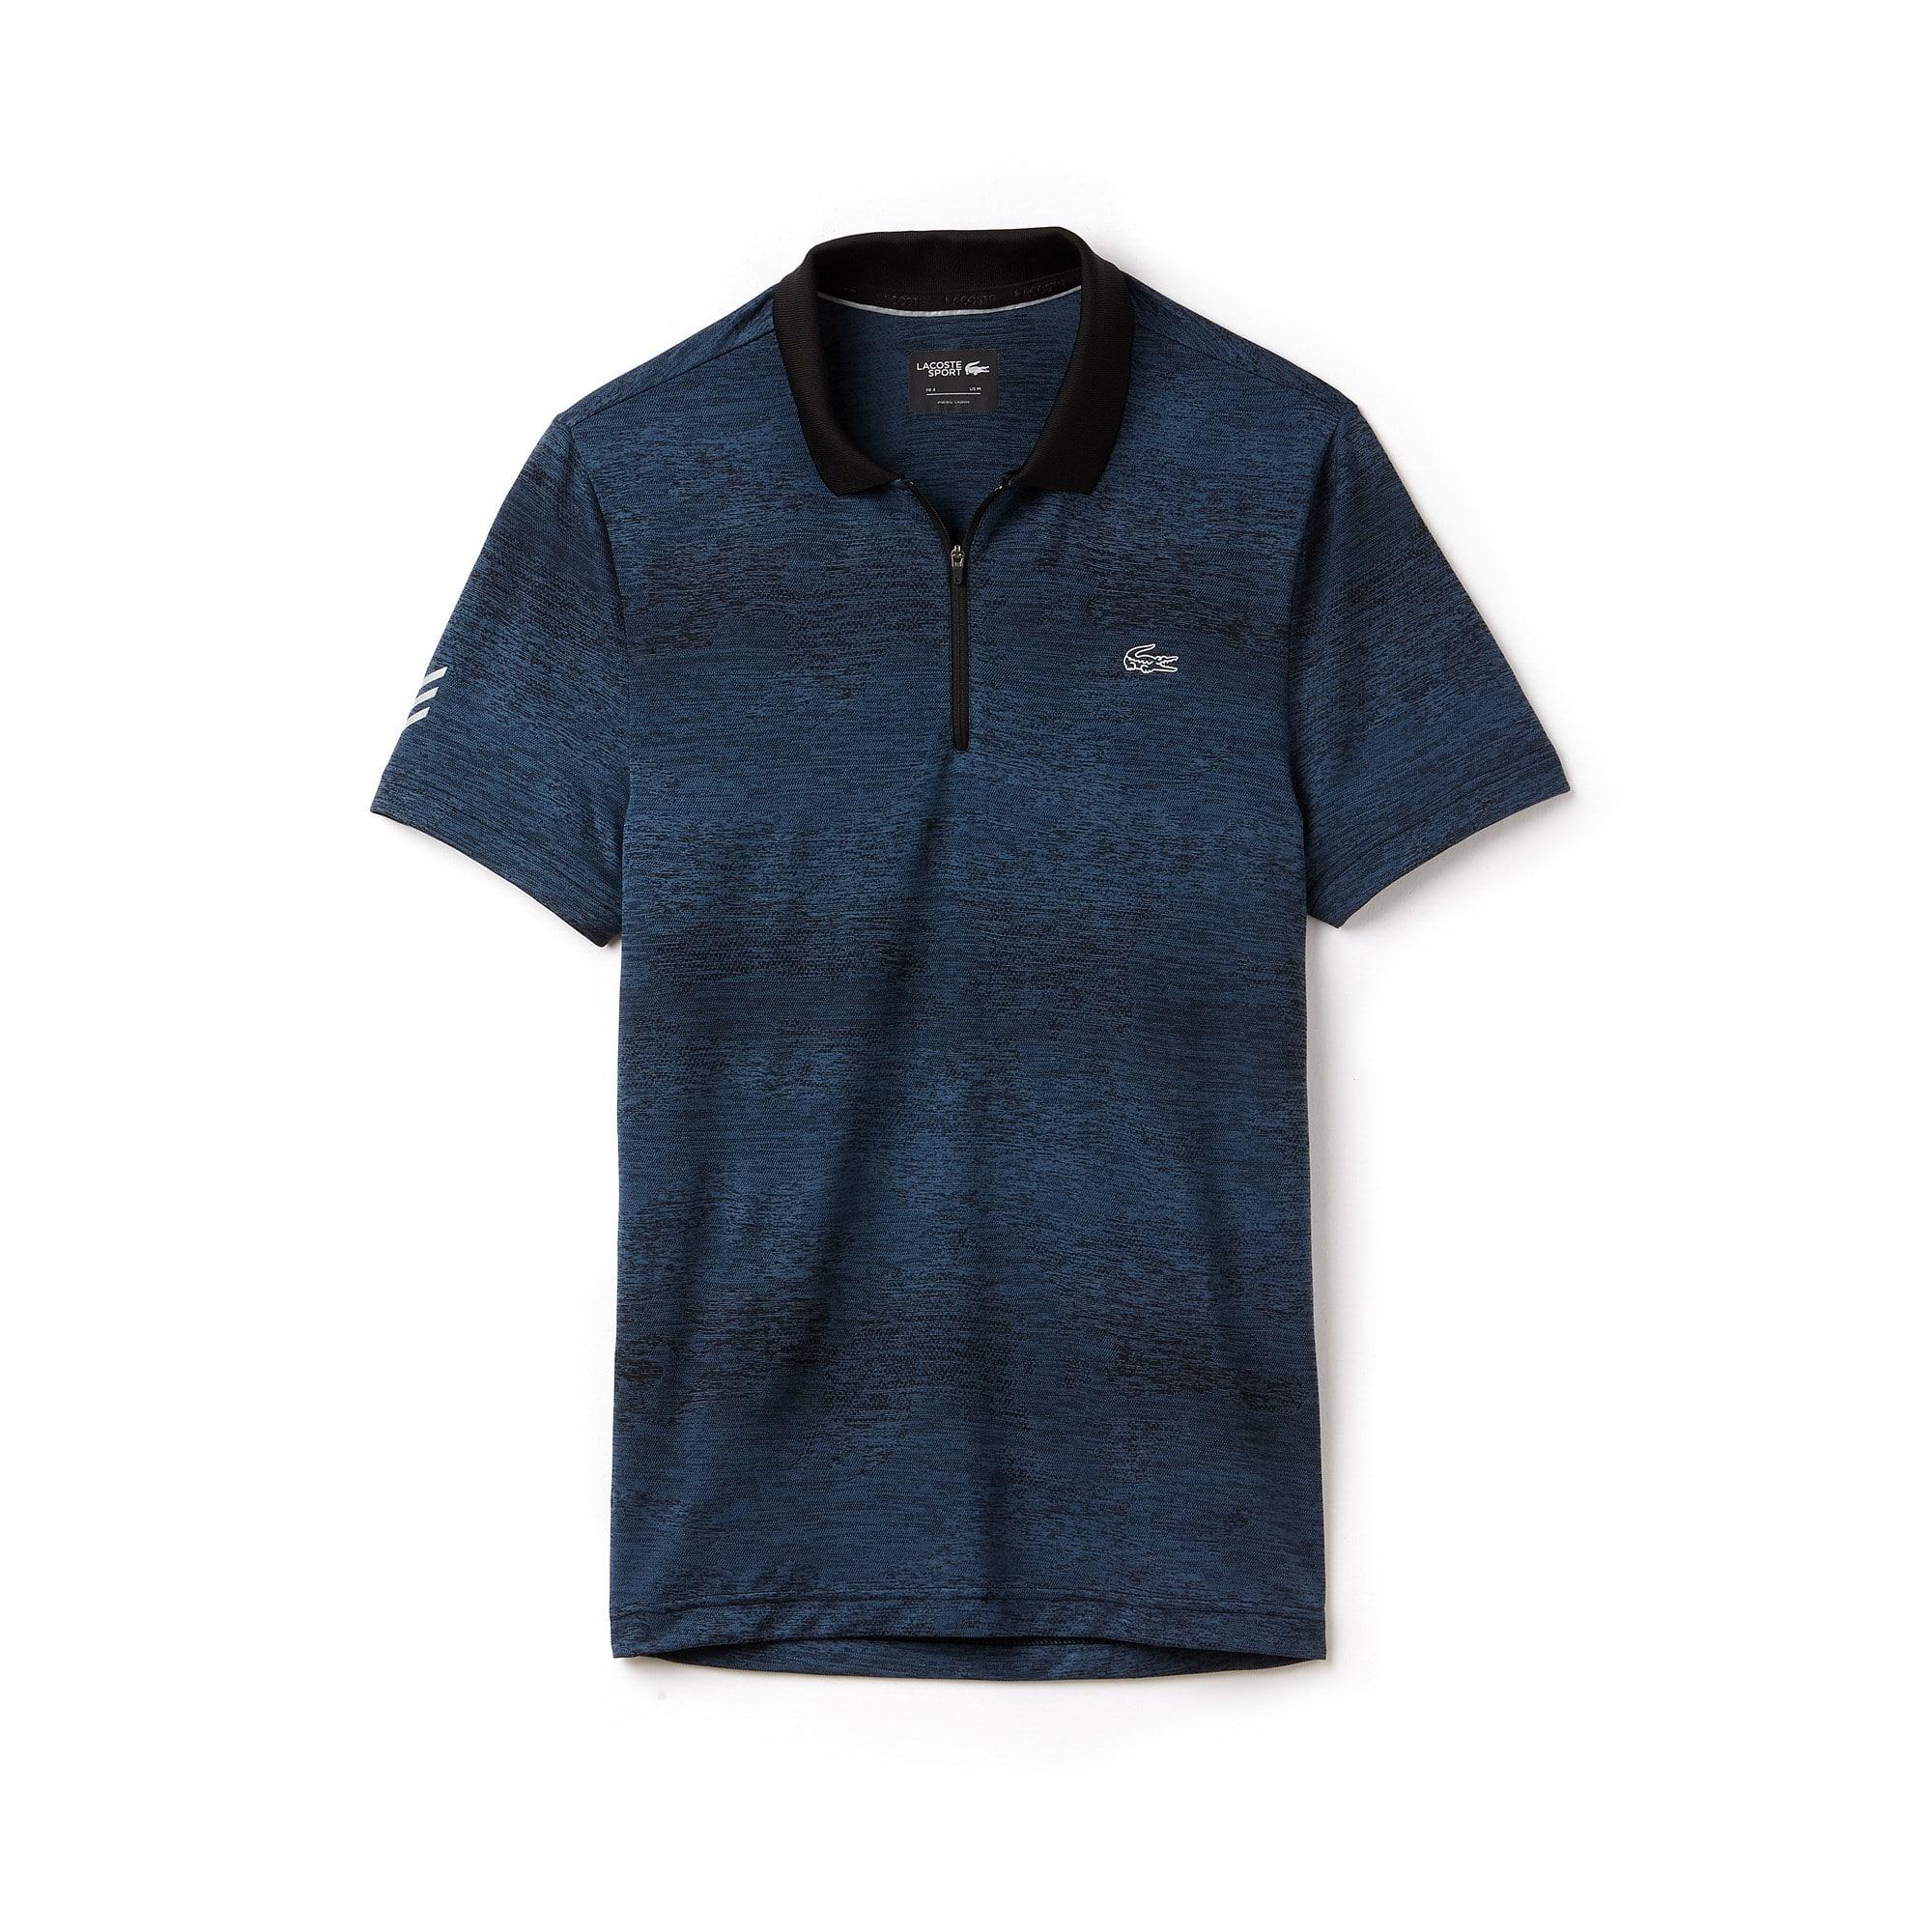 Men's Lacoste SPORT Zip Neck Print Technical Jersey Tennis Polo Shirt